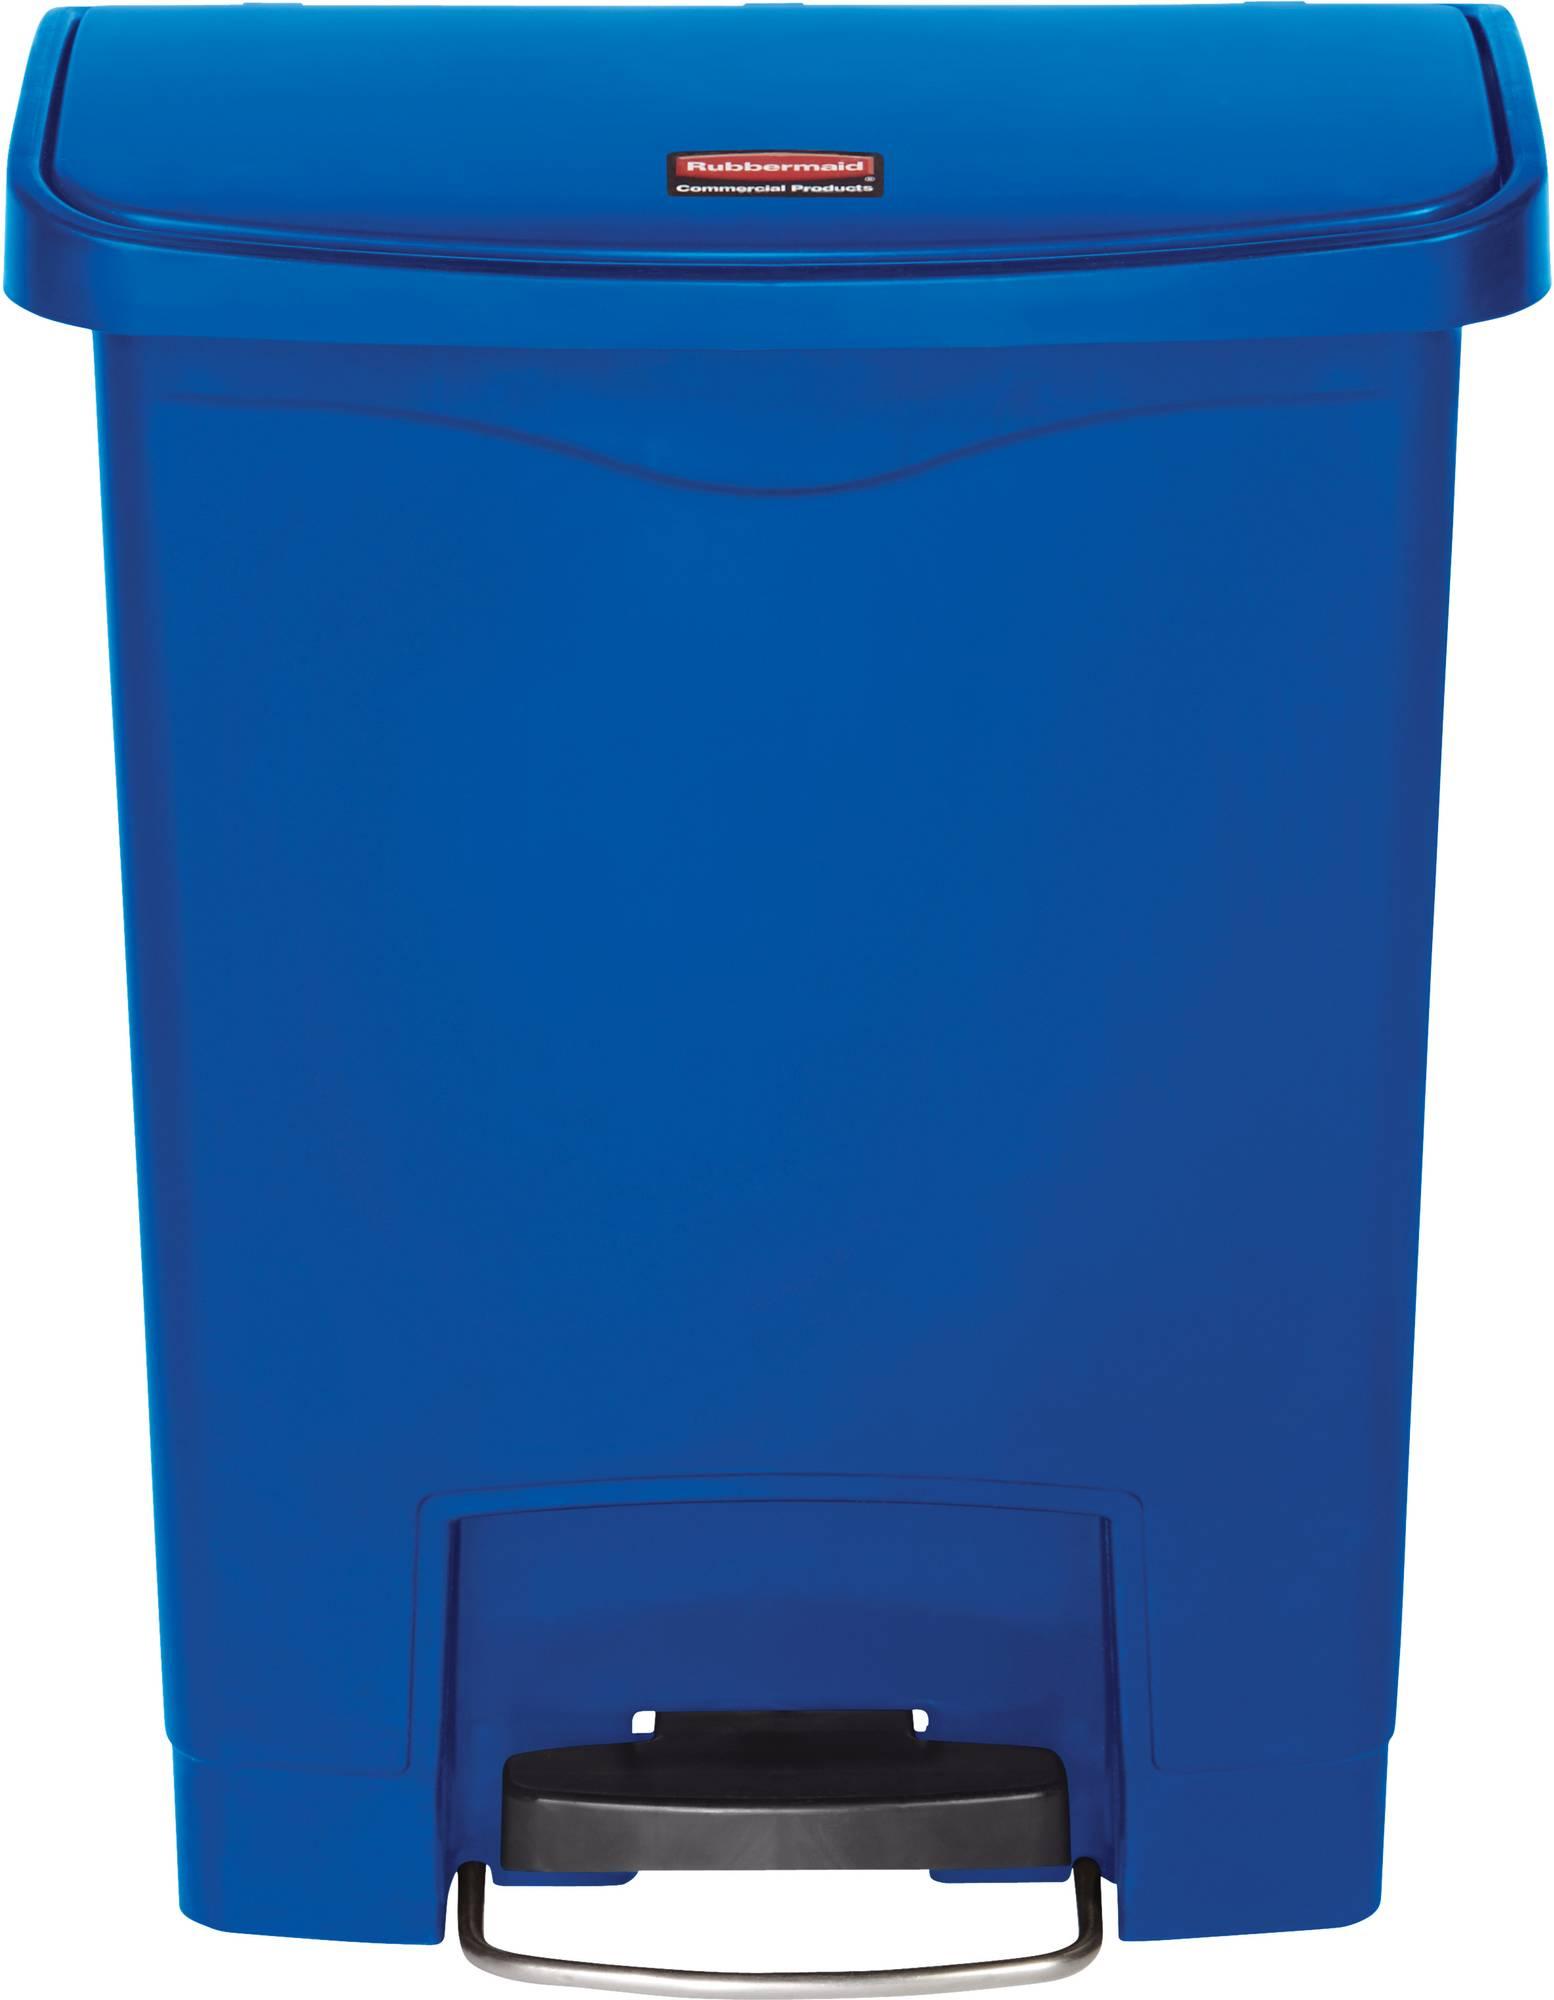 Rubbermaid Slim Jim Step On Container, Front Step mit 30 Liter Füllmenge in Blau, breites Fußpedal